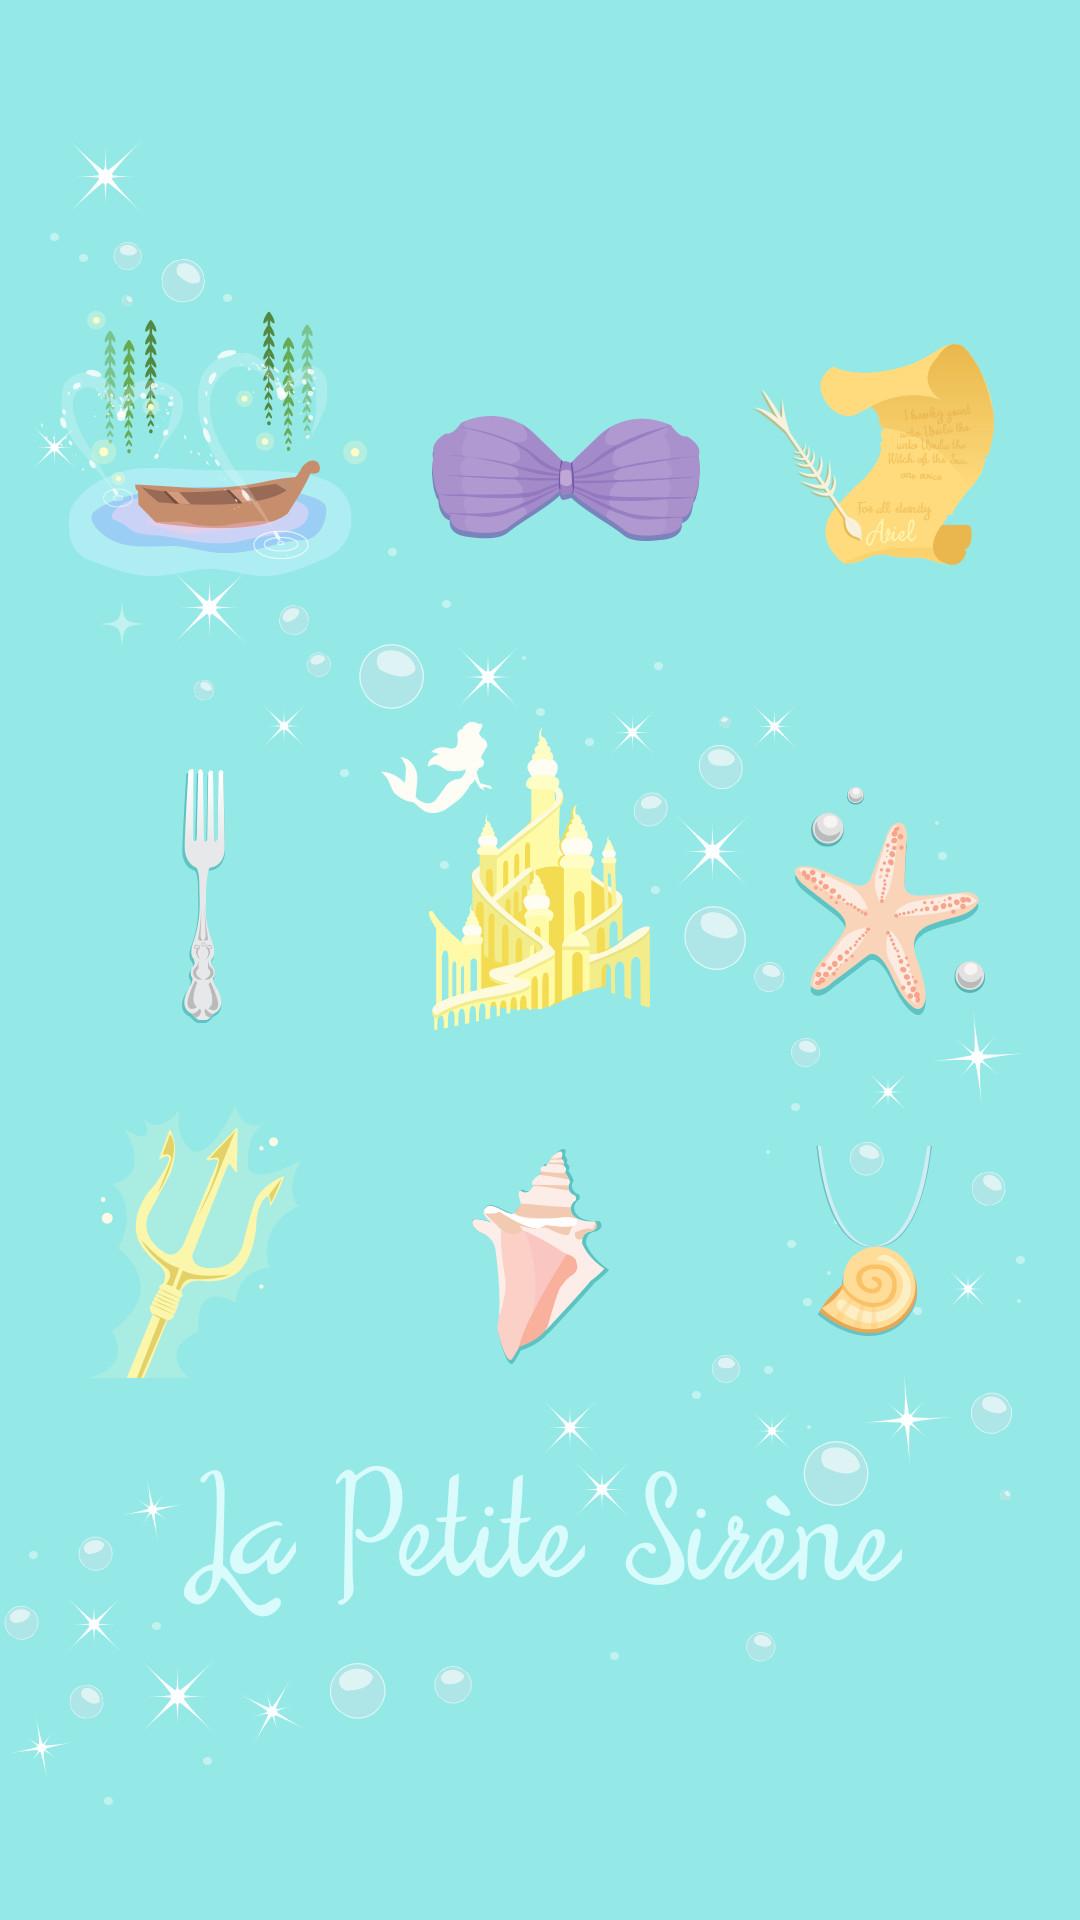 1080x1920 Iphone La Petite Sirene Little Mermaid Ariel Wallpaper Crecre Fond DACcran